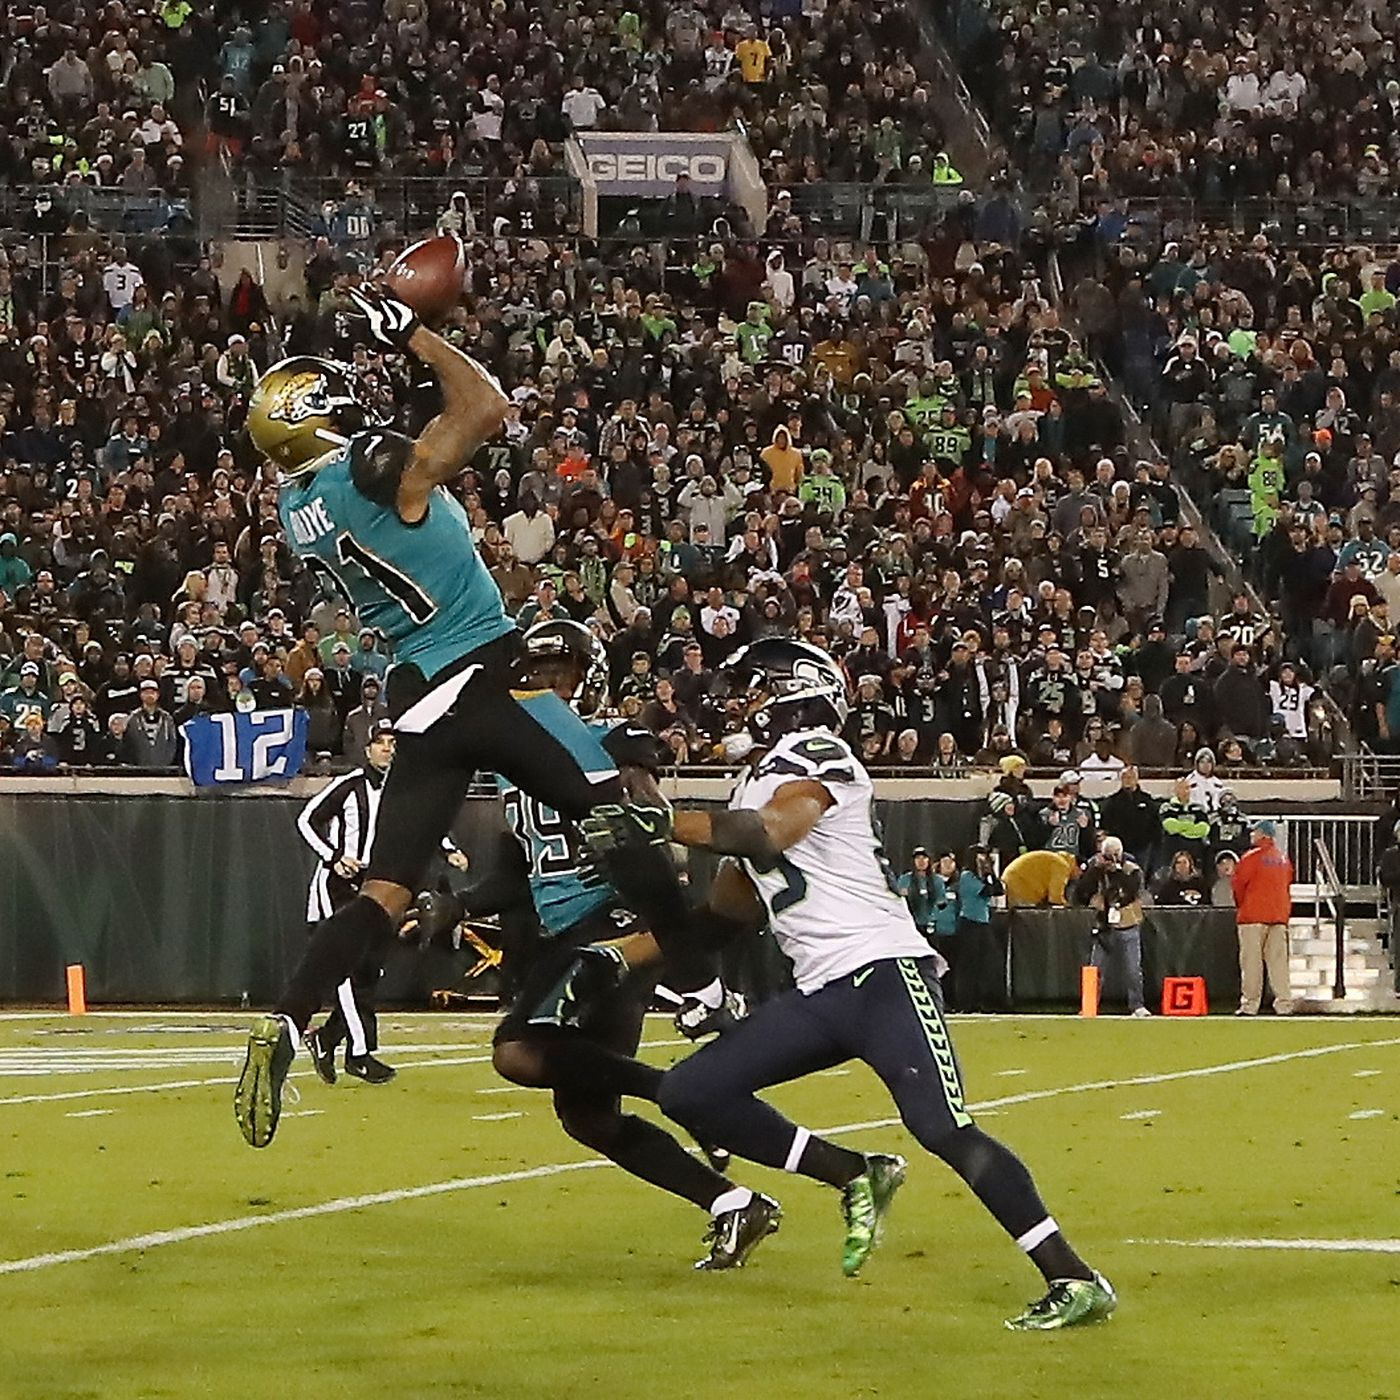 33f72638b9a Seahawks-Jaguars final score  Seattle loses 30-24 as 4th quarterback  comeback falls short